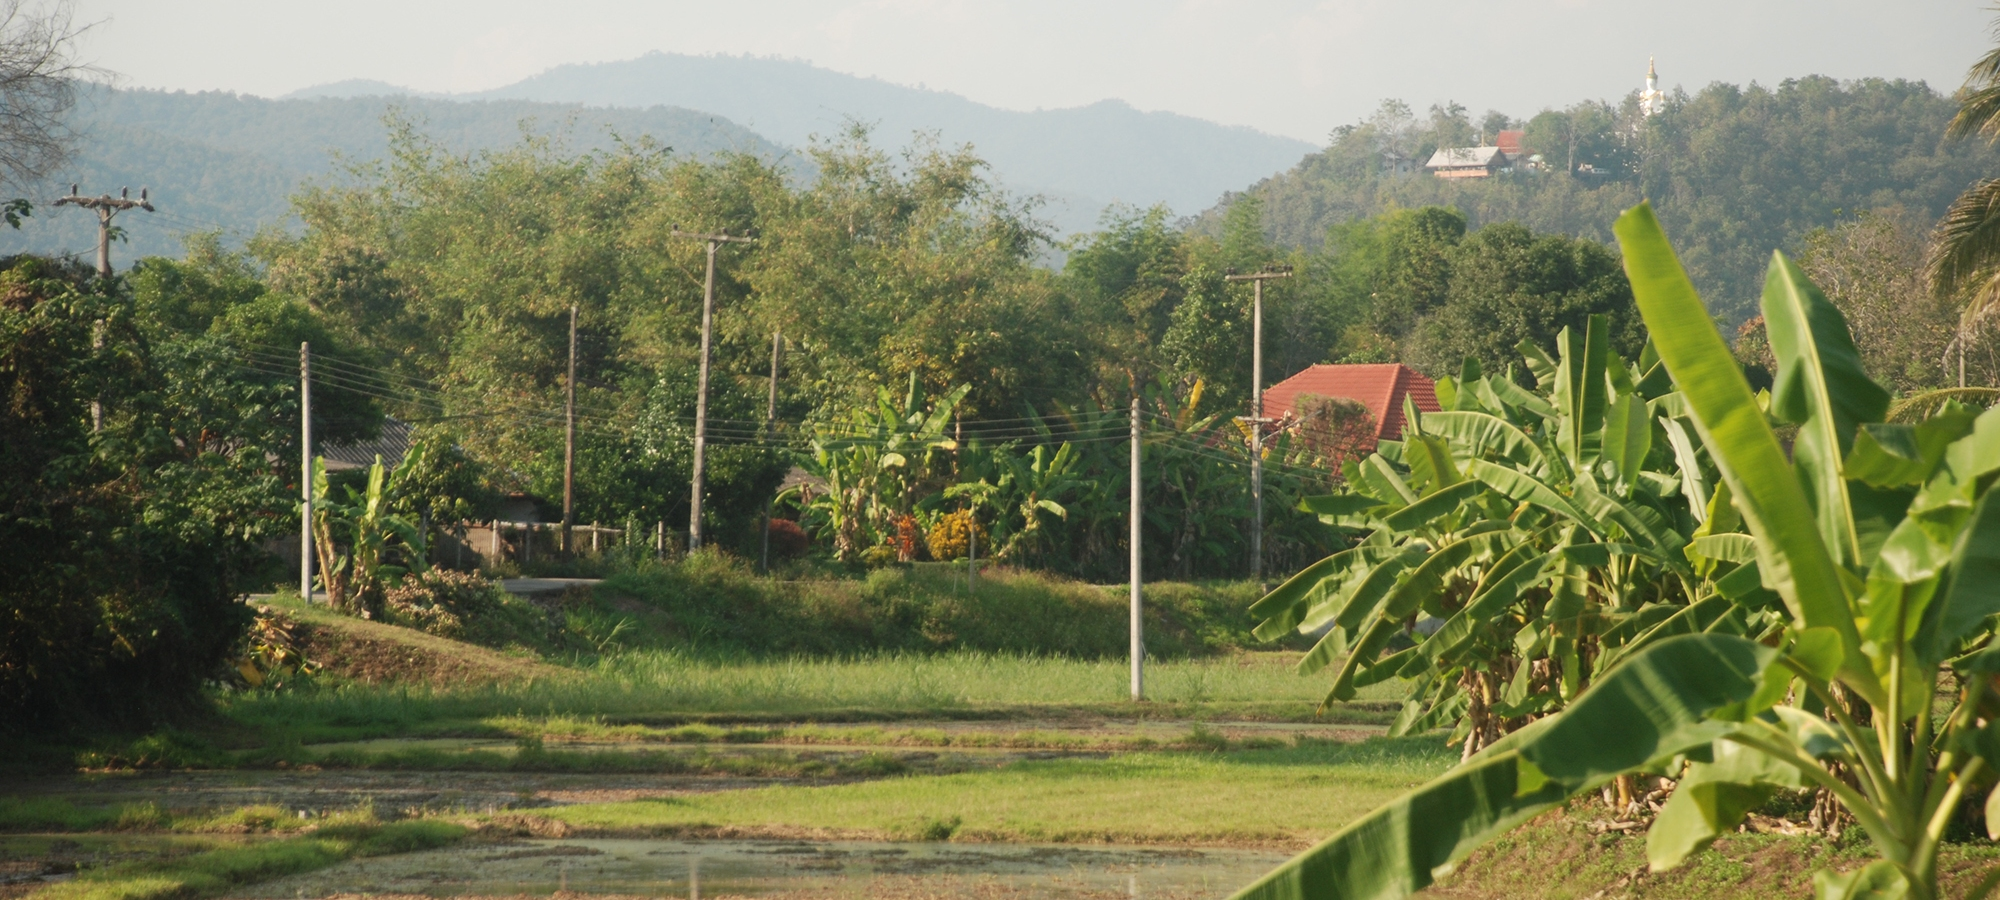 Around the Doi Saket, Studio 88 Artist Residency, Chiang Mai